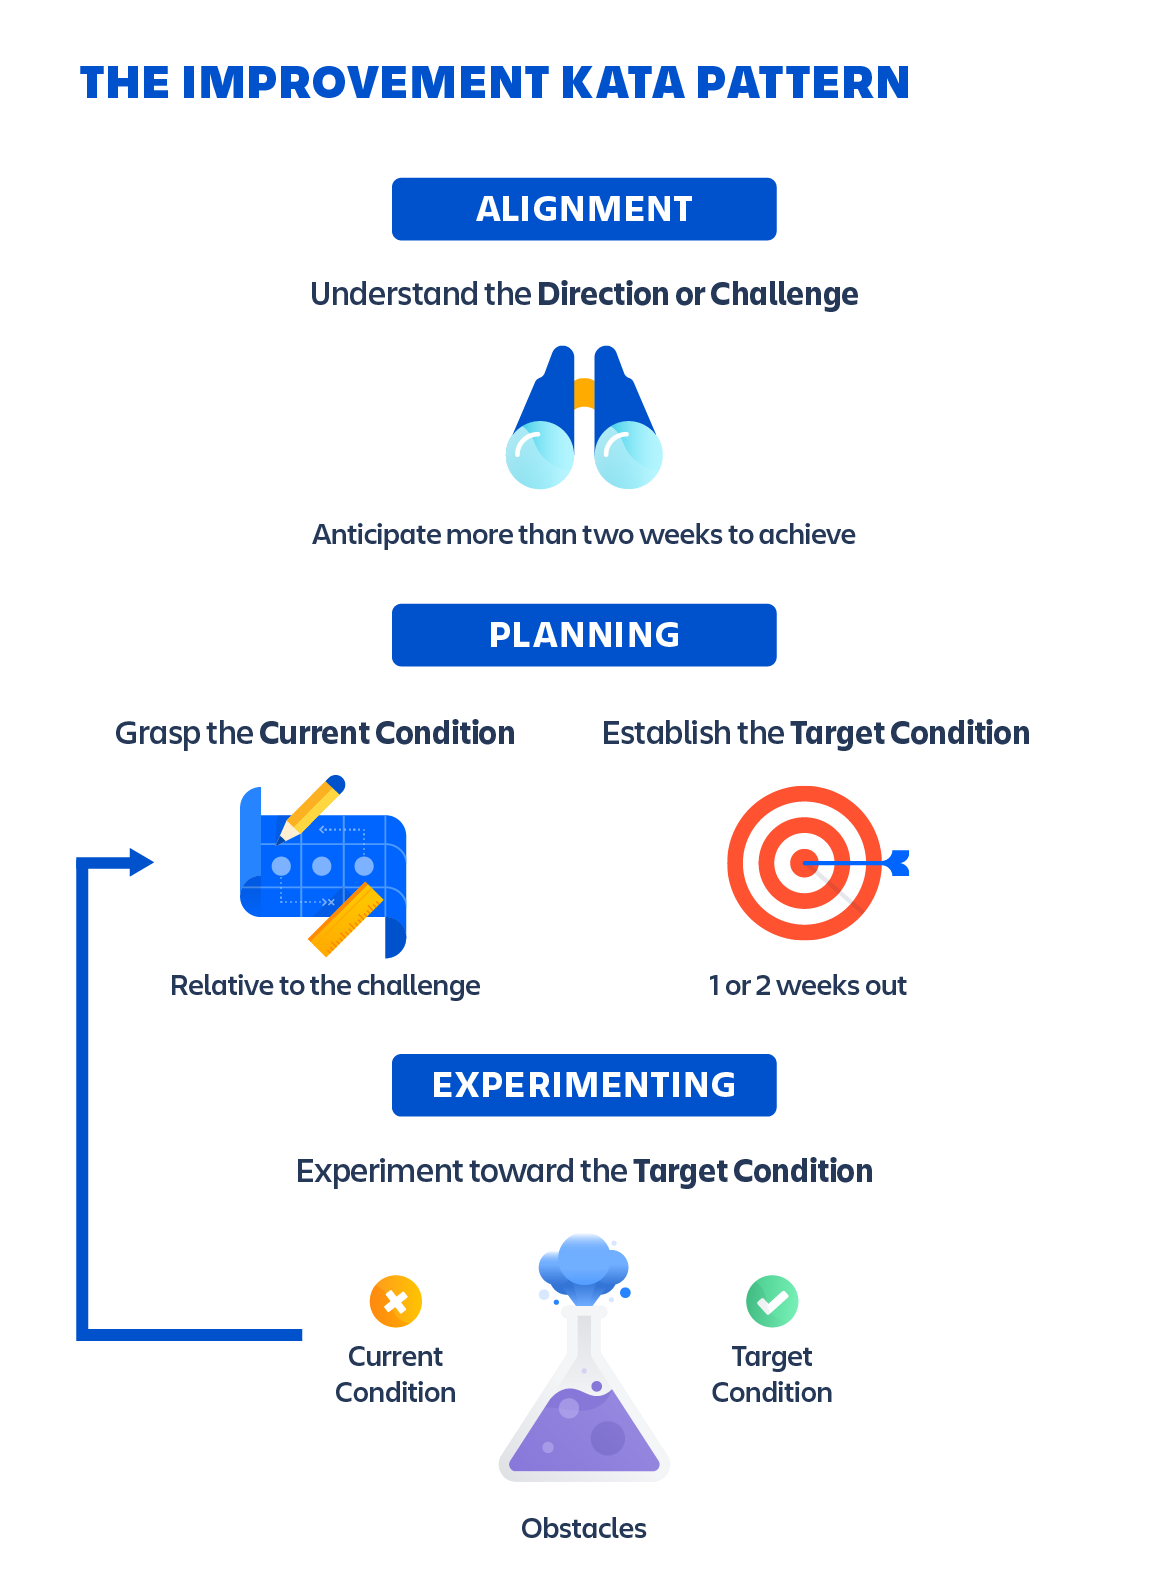 Diagram outlining the Improvement Kata Pattern